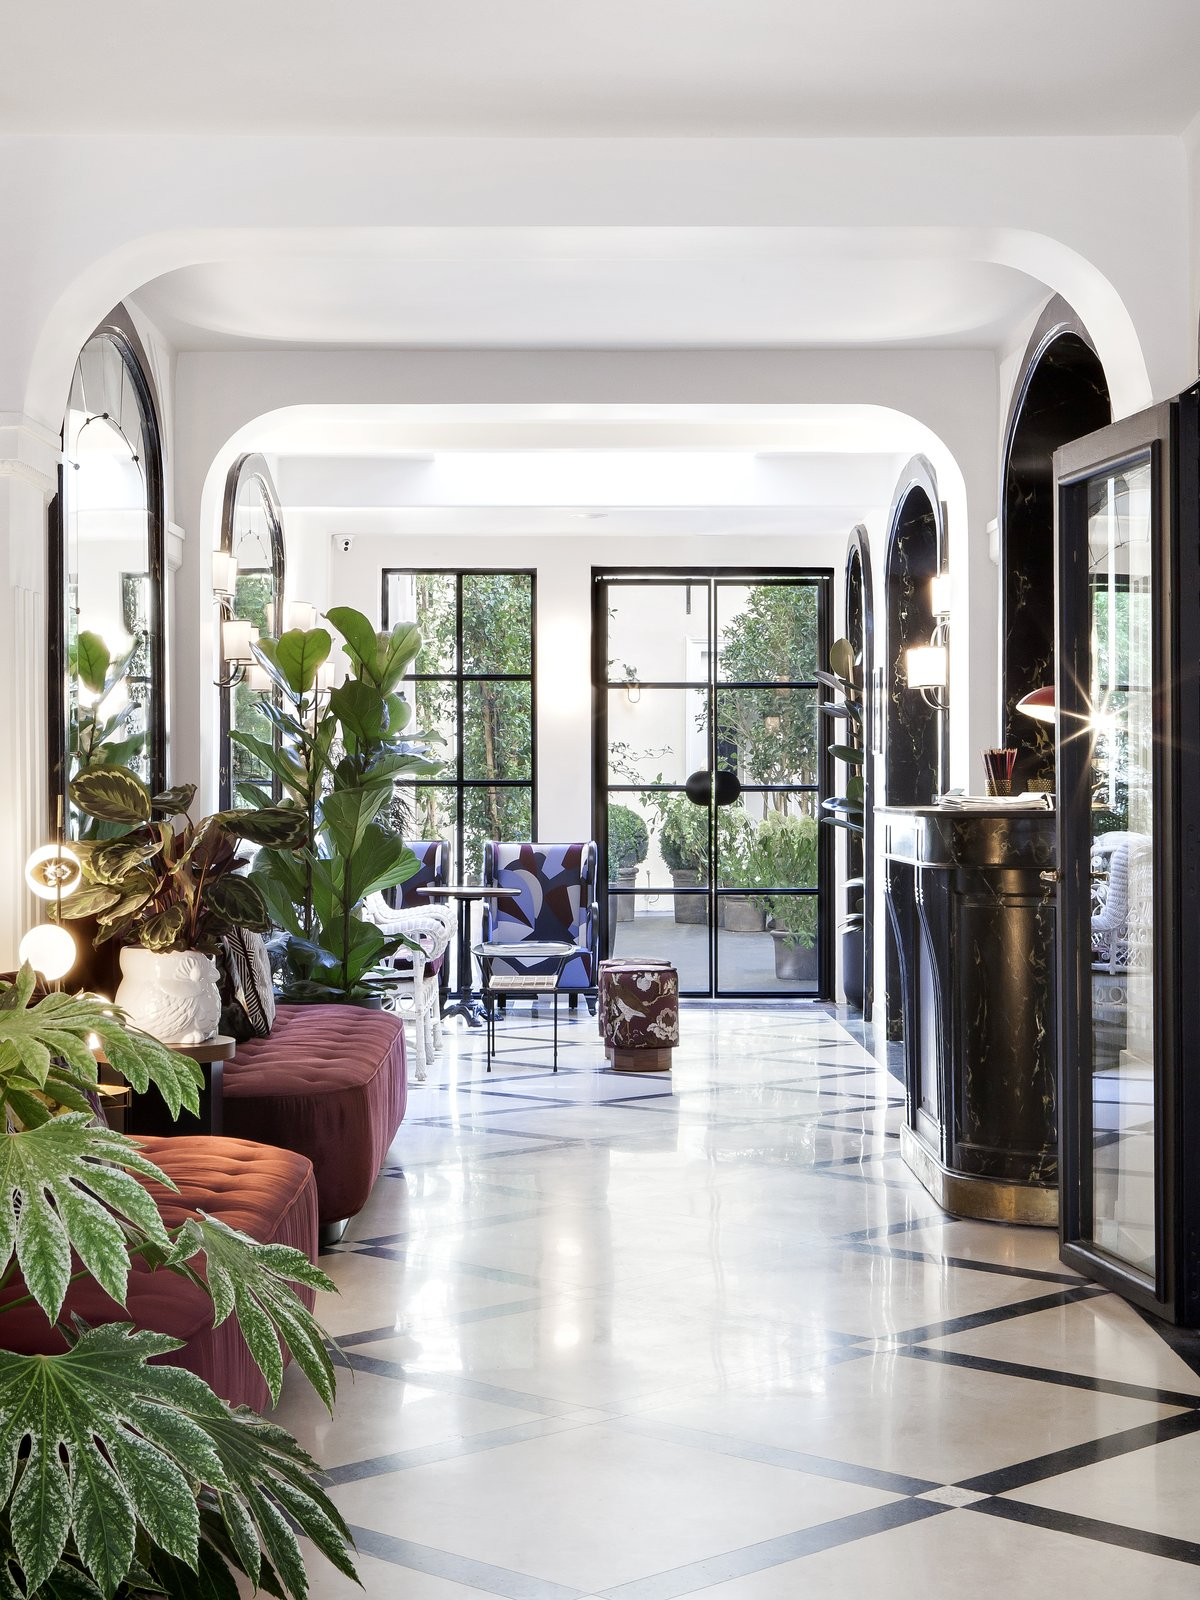 Hotel Bienvenue lobby